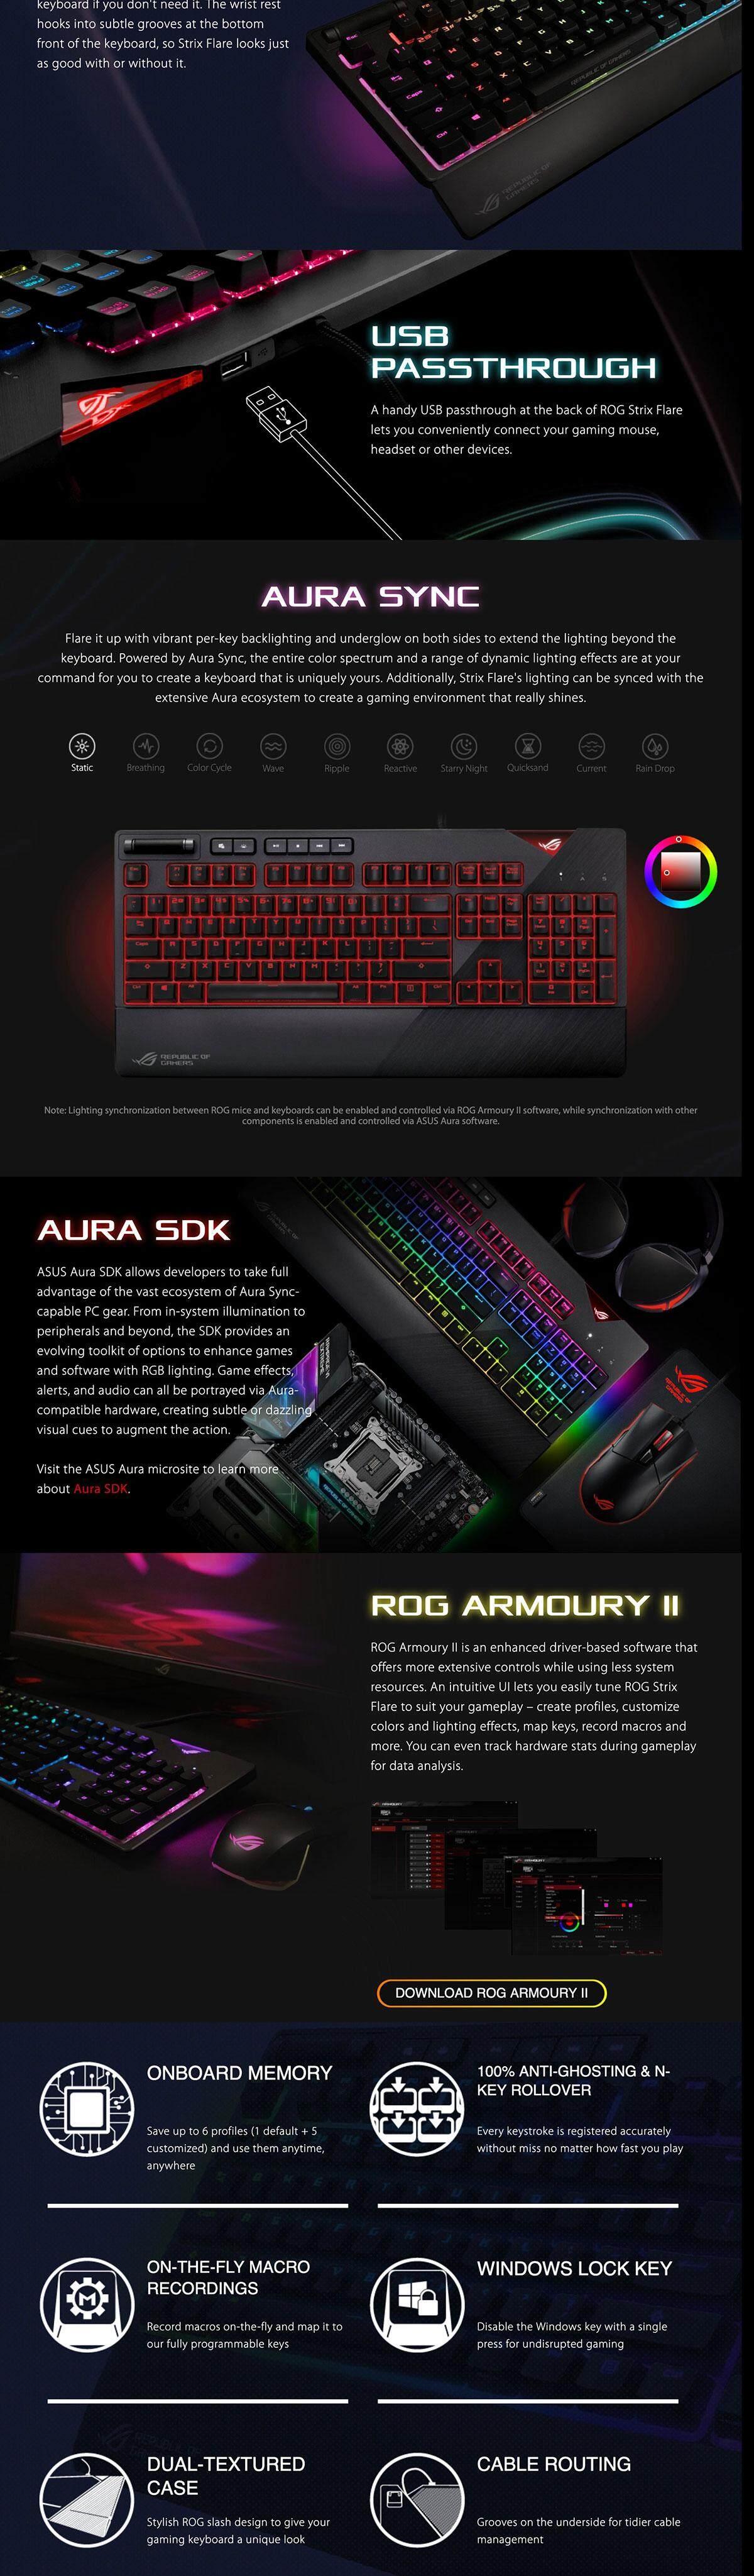 ASUS ROG Strix Flare Mechanical Gaming Keyboard with RGB